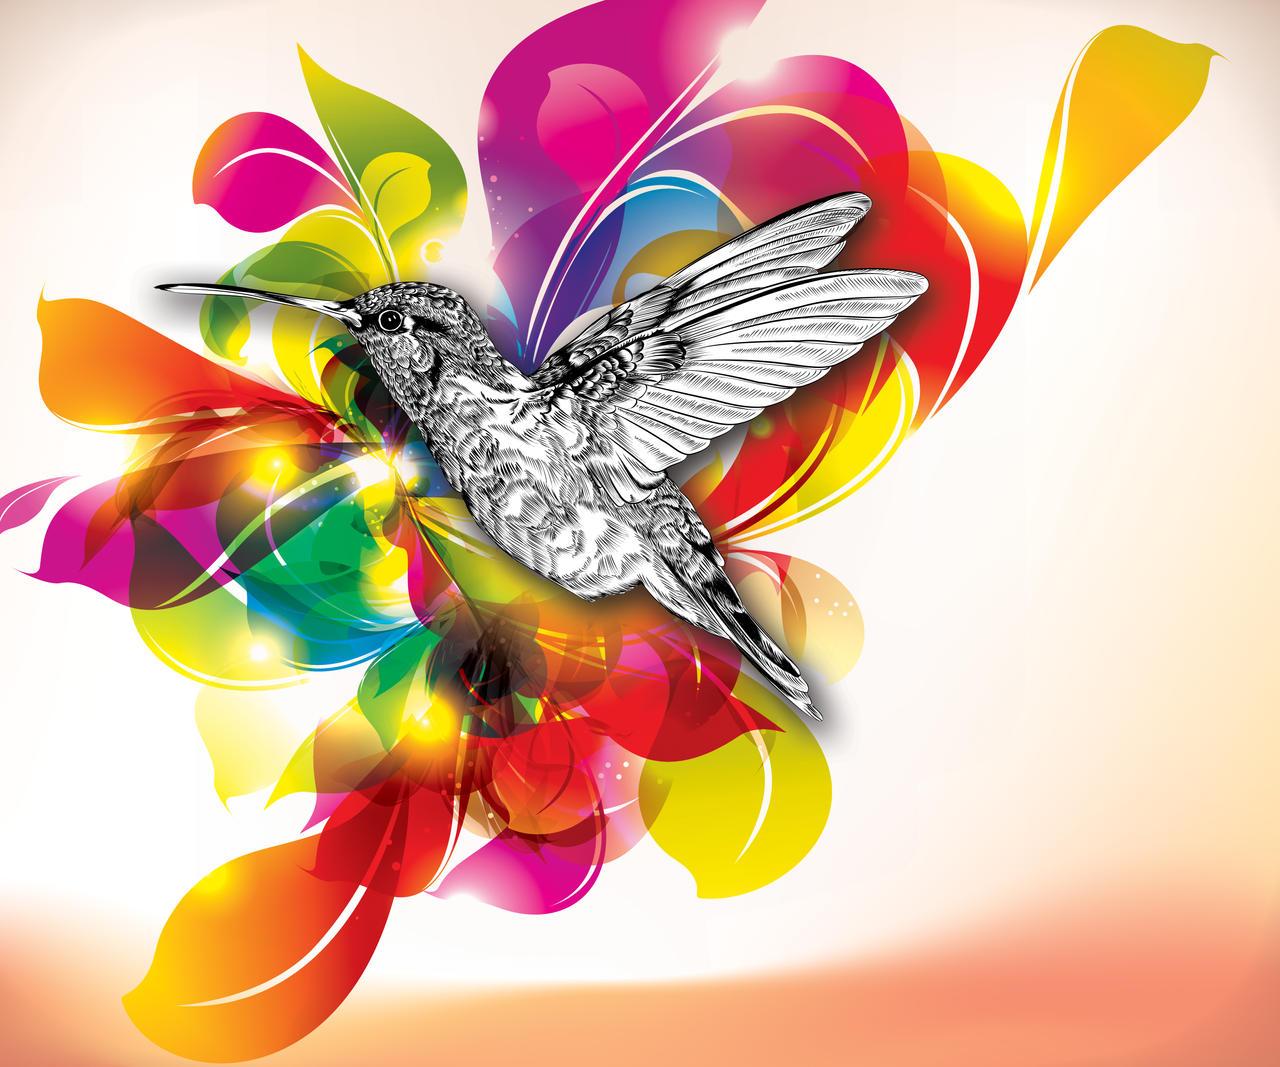 Flights of Color by dizzyflower28